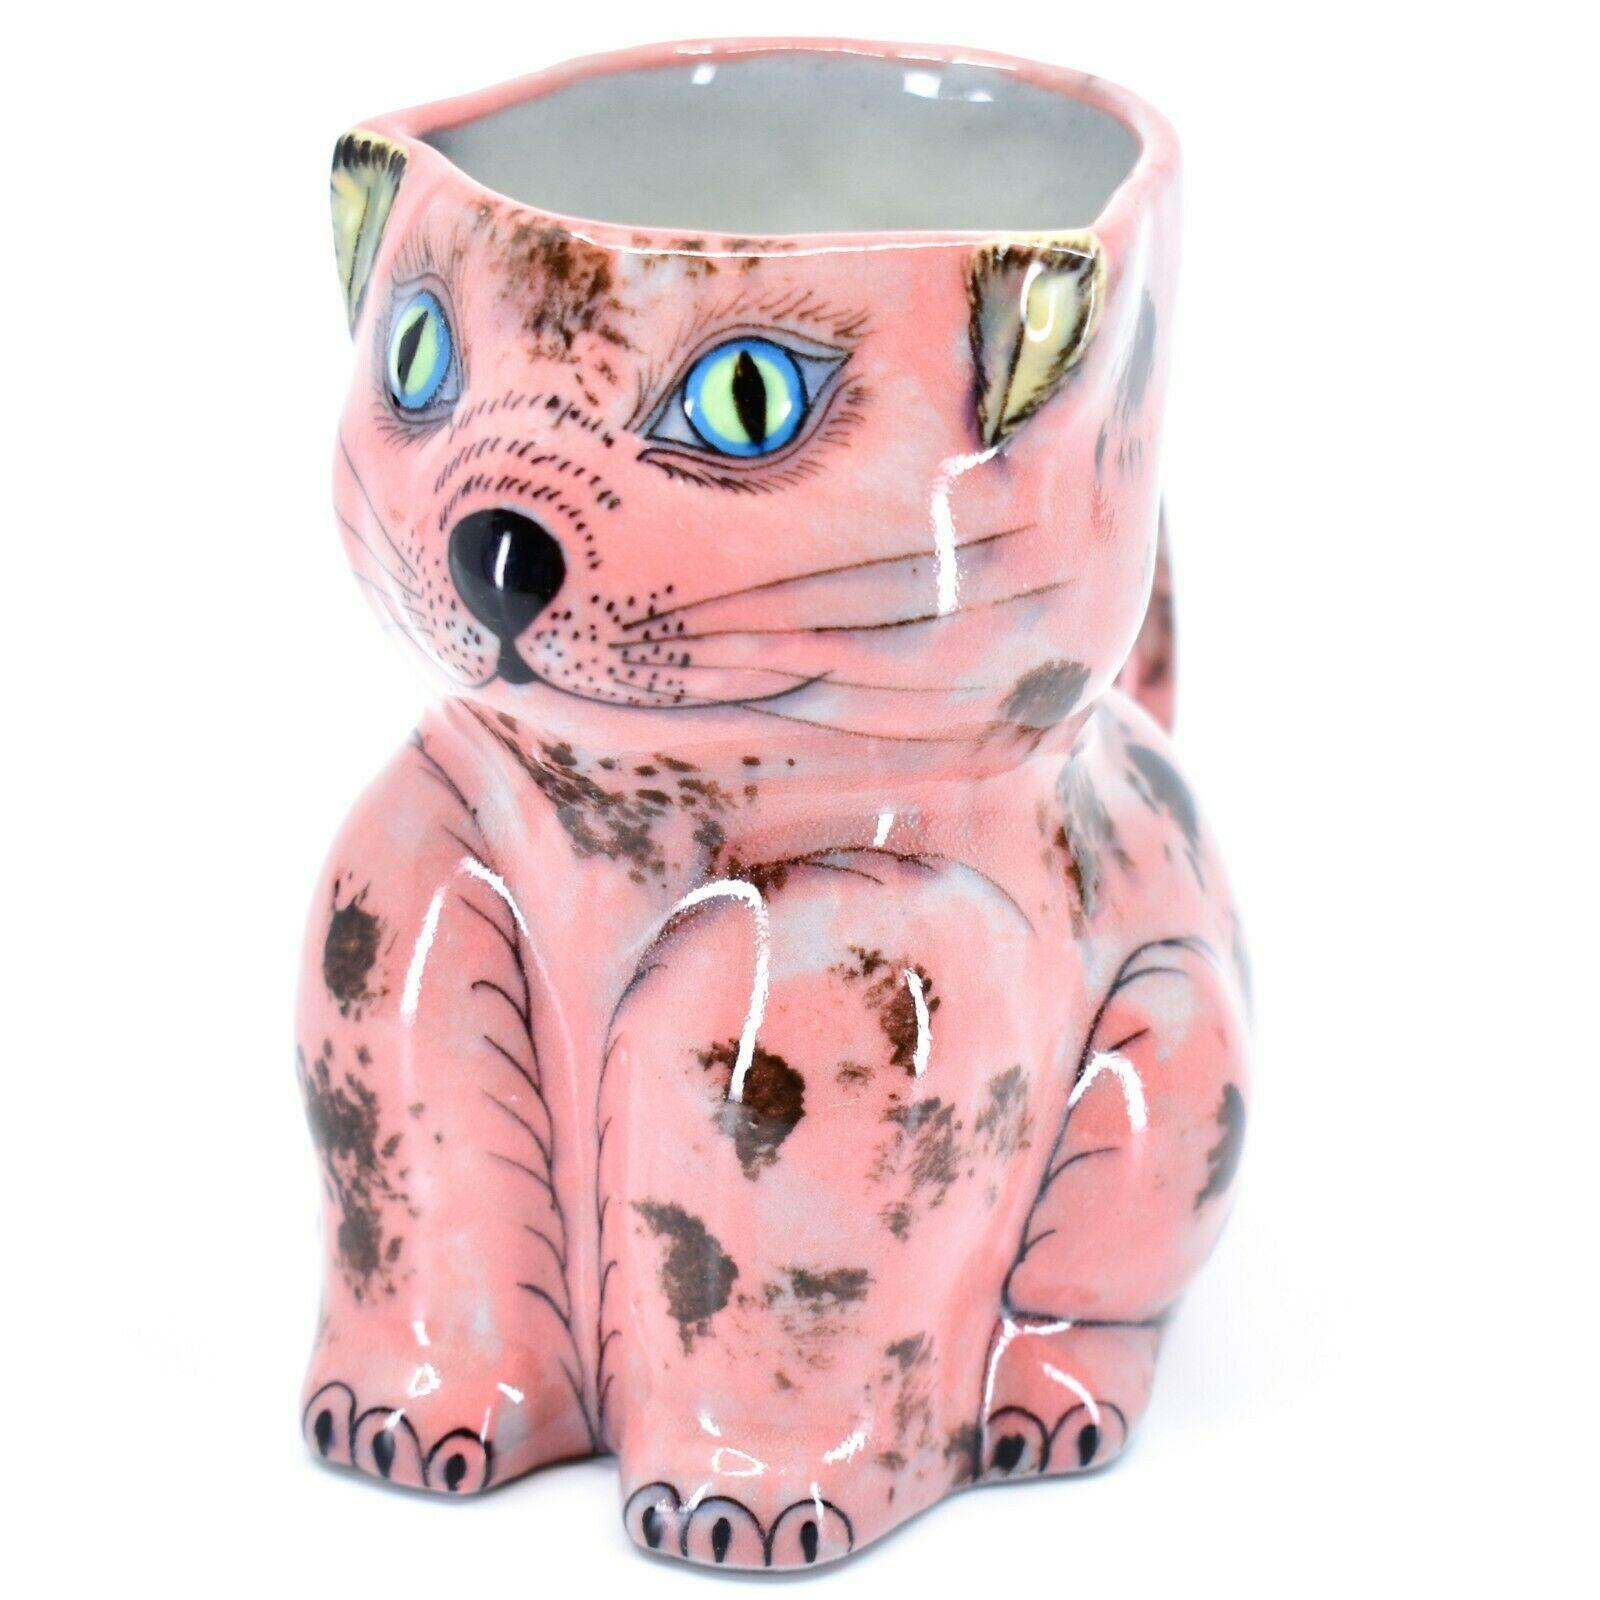 Ceramic Hand Painted Kitten Cat Figure Coffee Cup Mug Handmade Guatemala